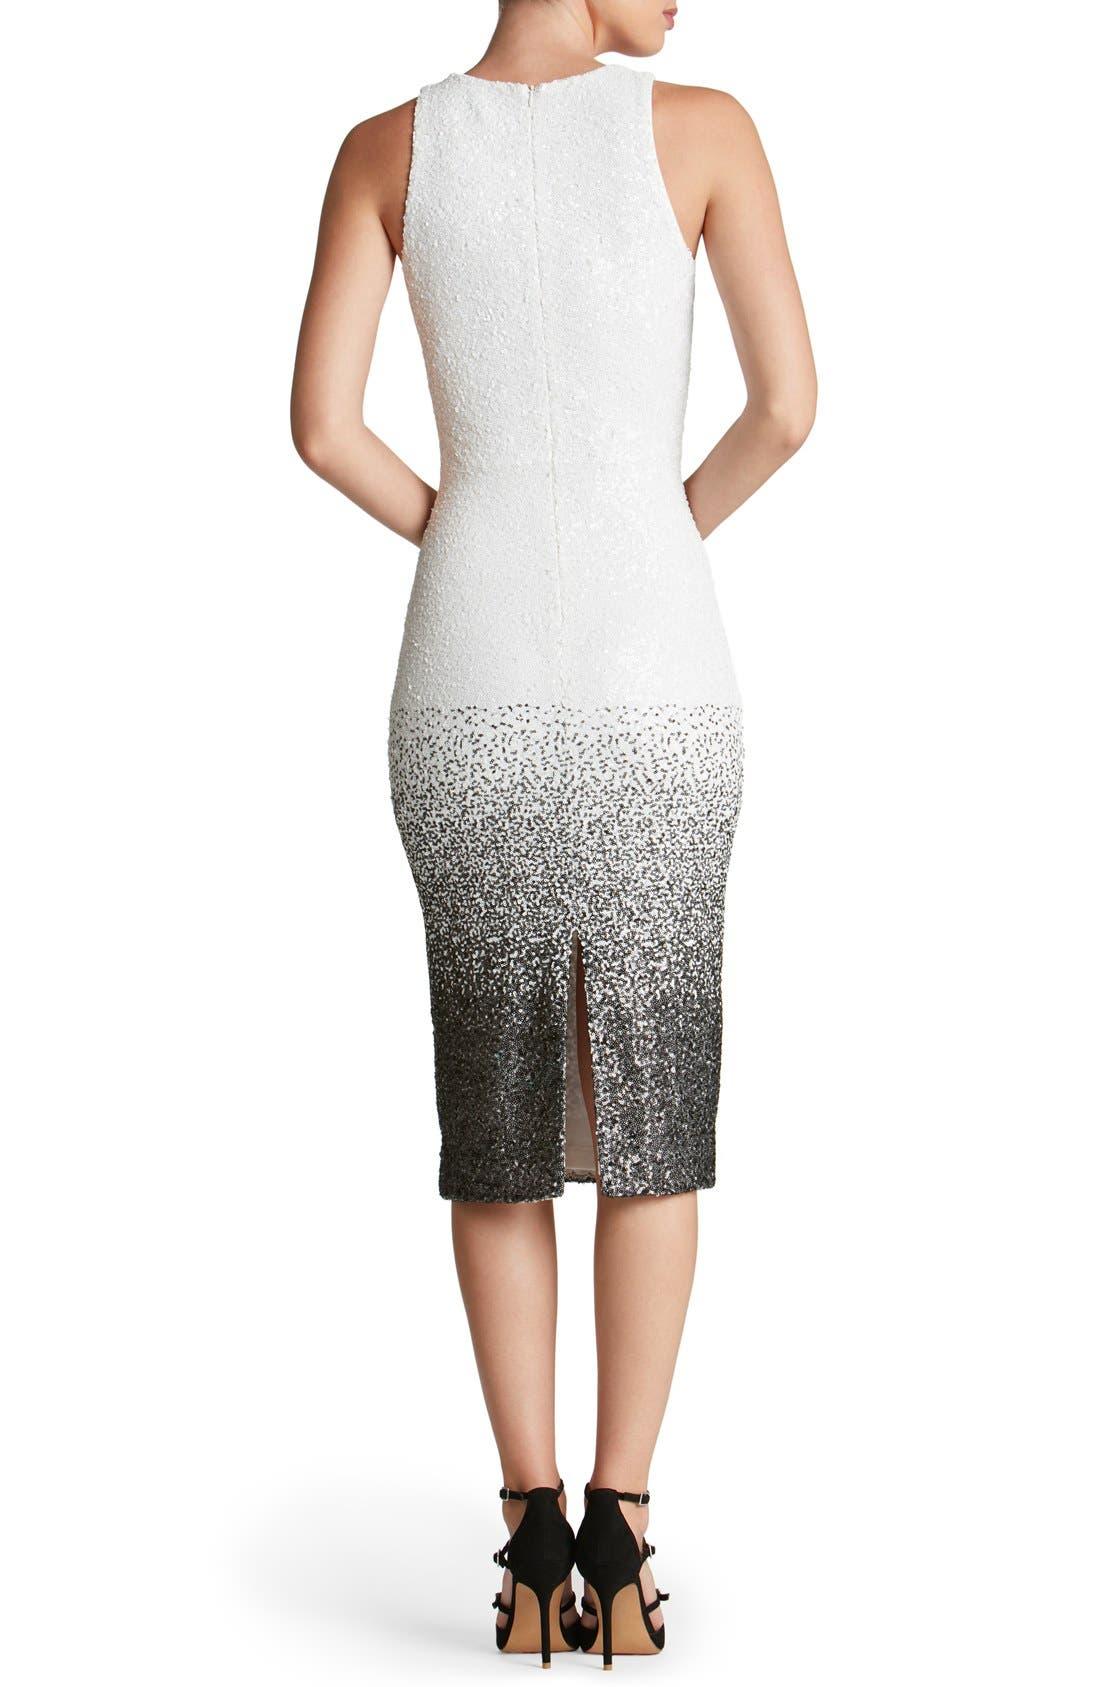 Shawn Sequin Midi Dress,                             Alternate thumbnail 2, color,                             121